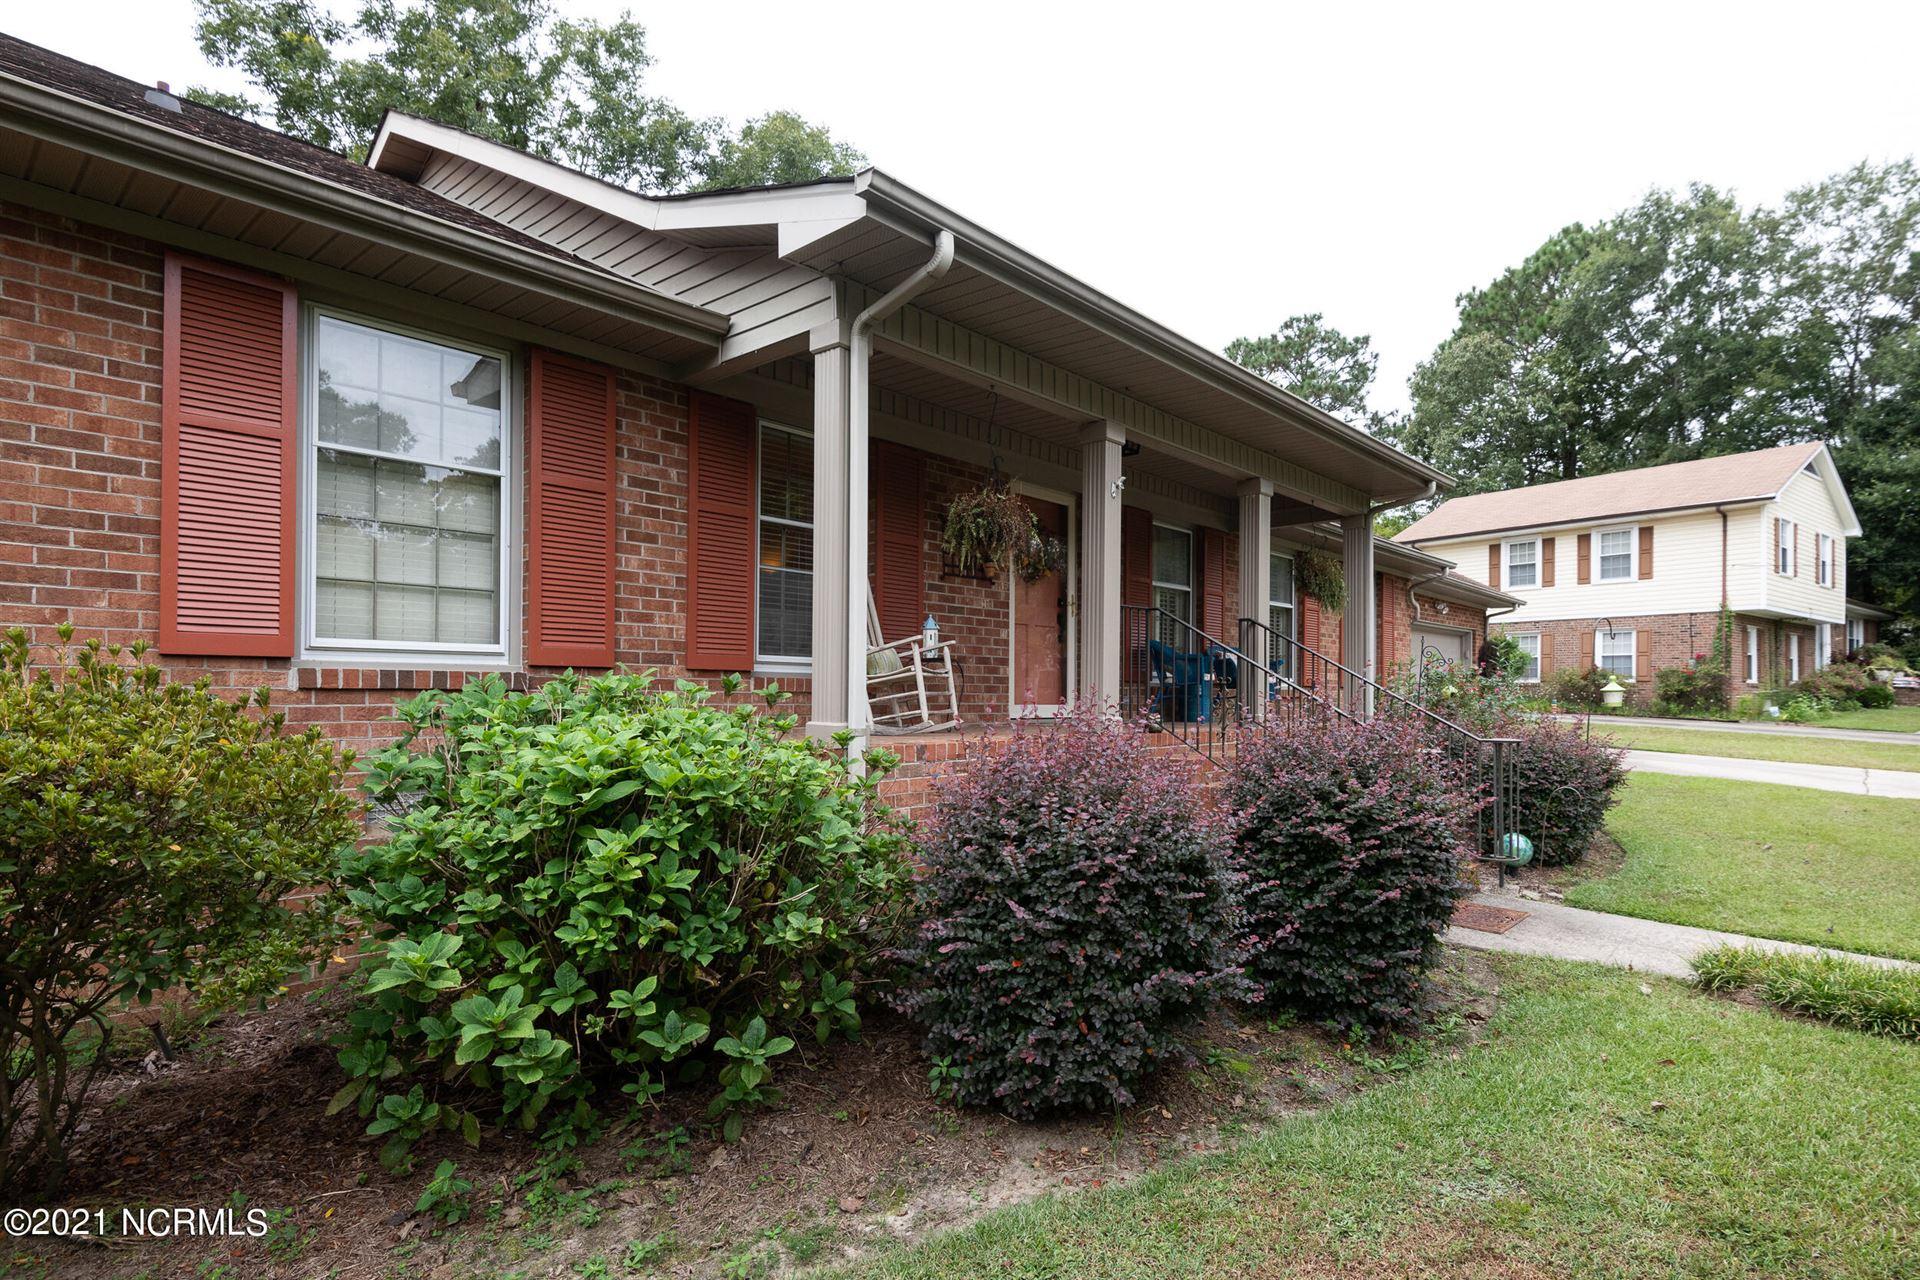 Photo of 107 Graham Street, Greenville, NC 27858 (MLS # 100291203)